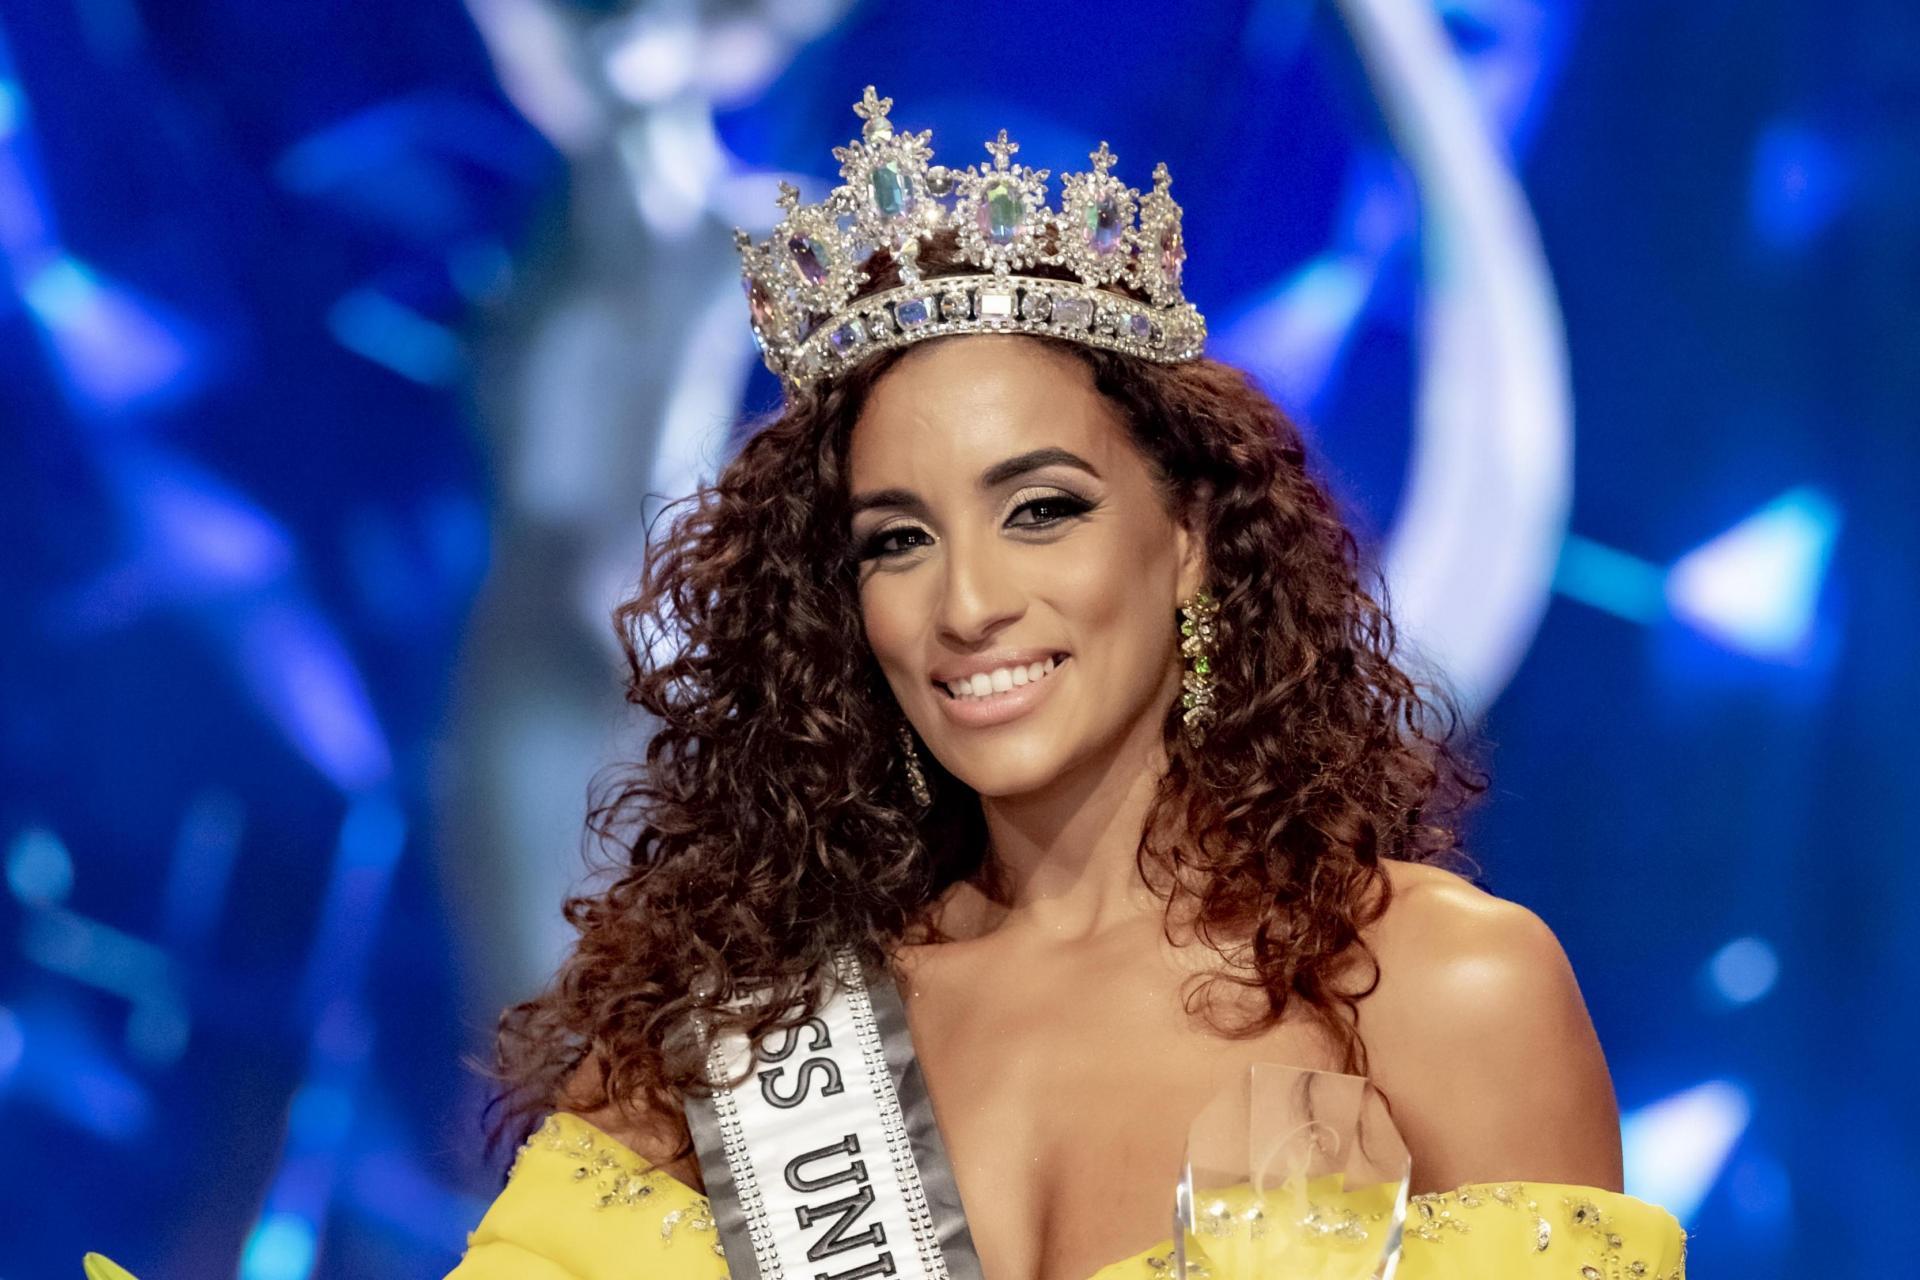 Zammit crowned to represent Malta last August.